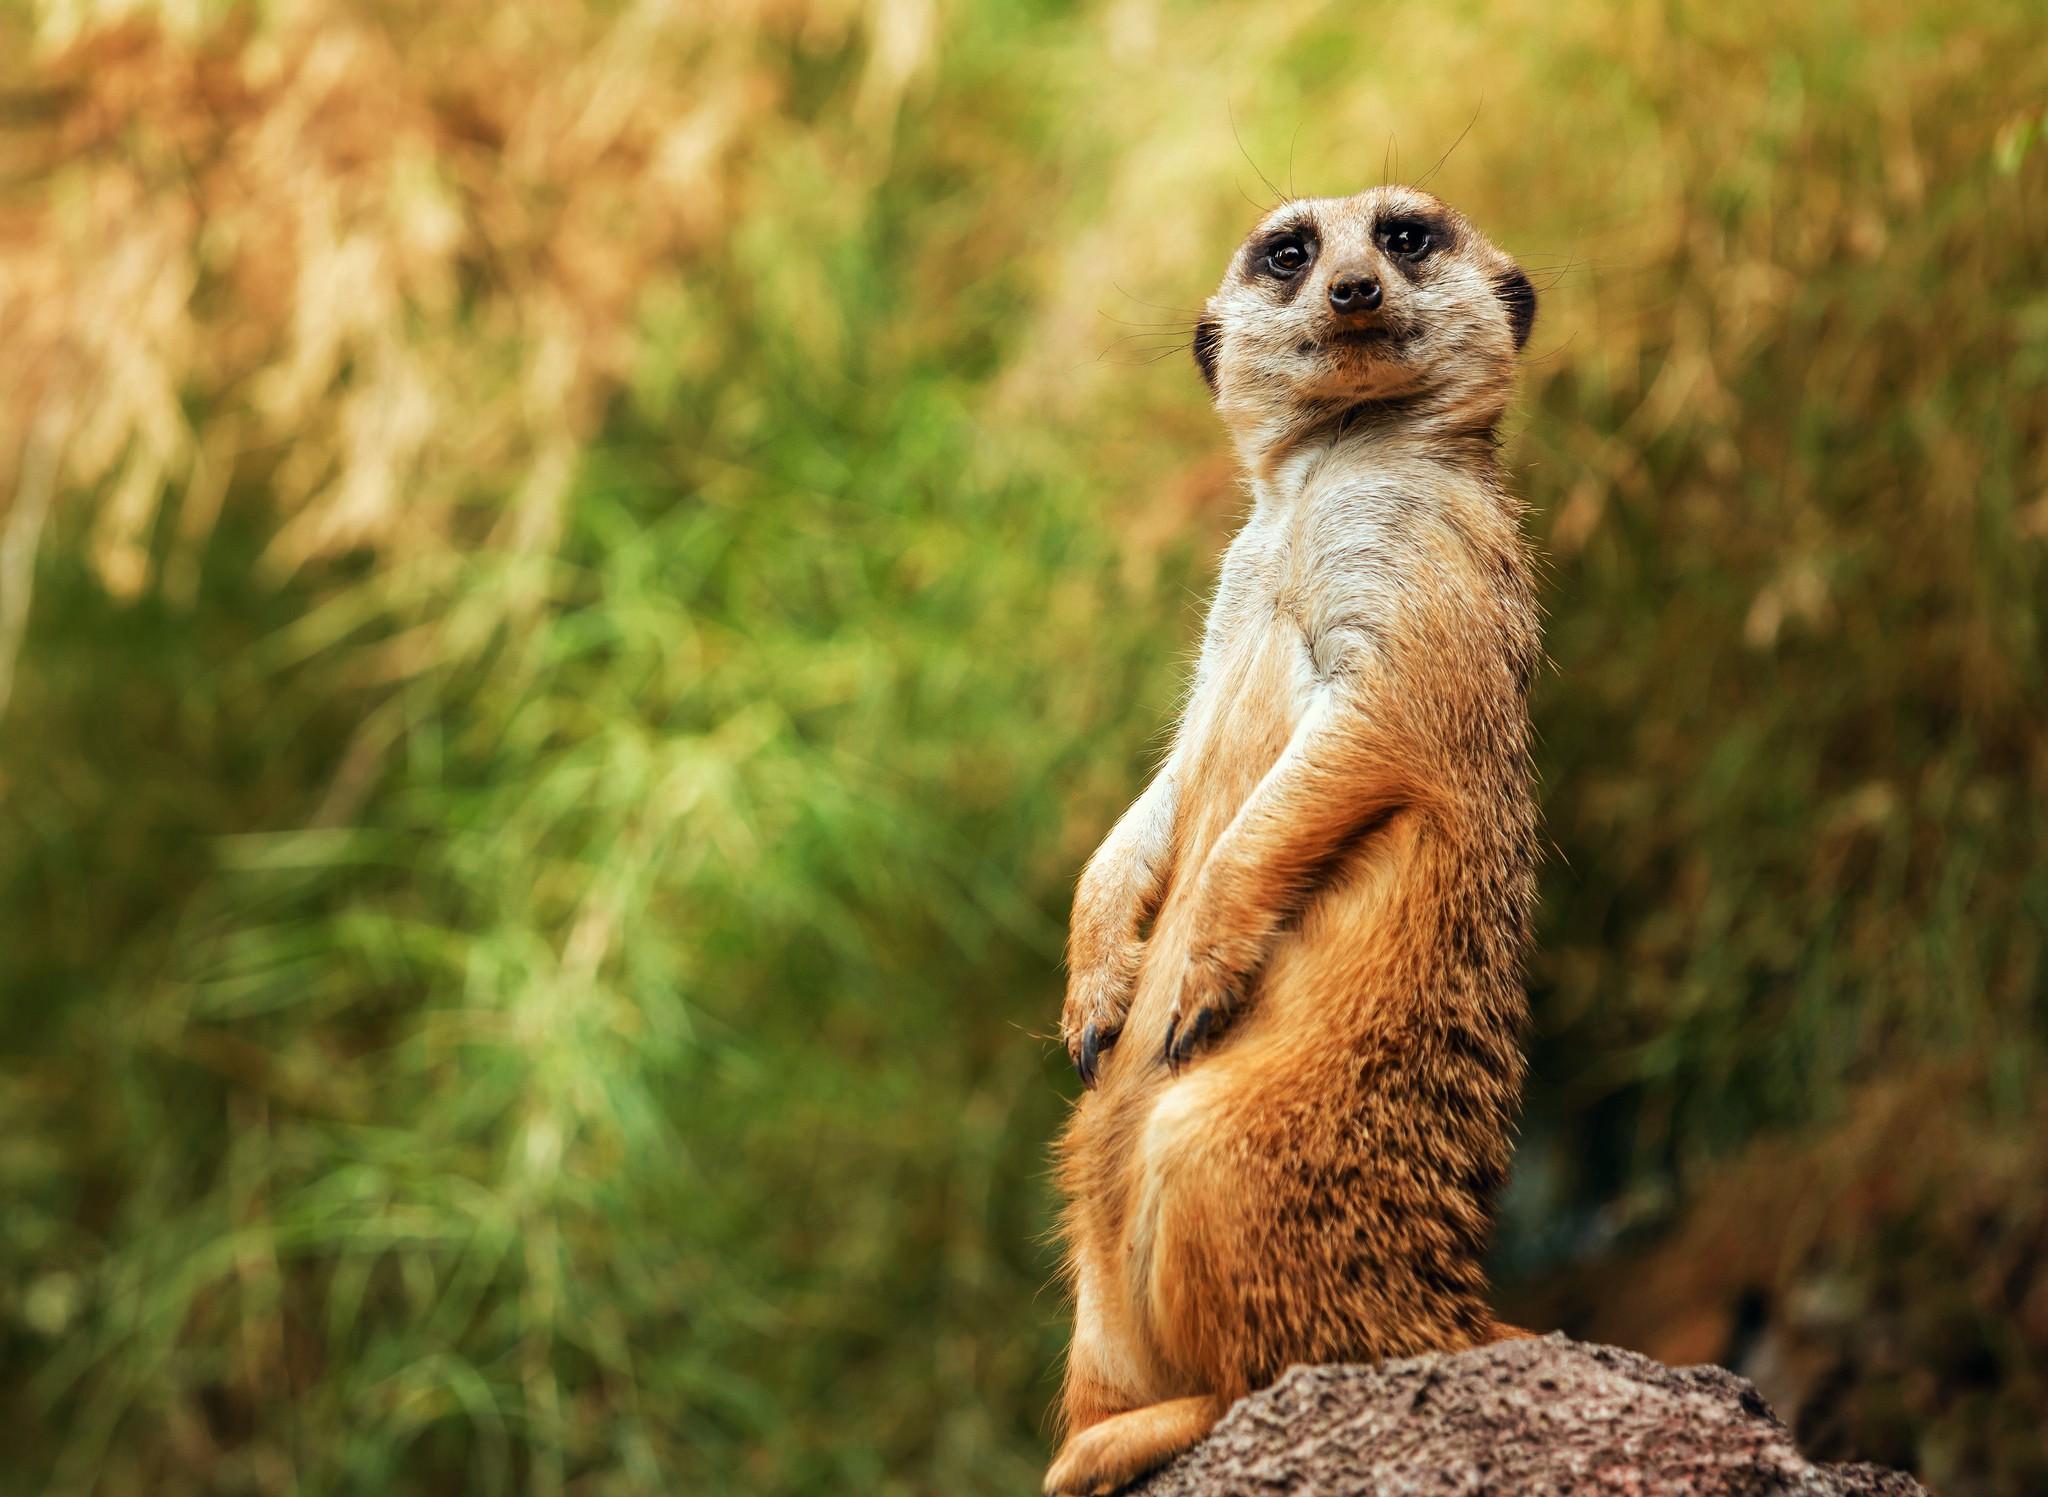 Cute Baby Girl Hd Wallpapers 1080p Meerkats Posture Wallpaper Animals Wallpaper Better